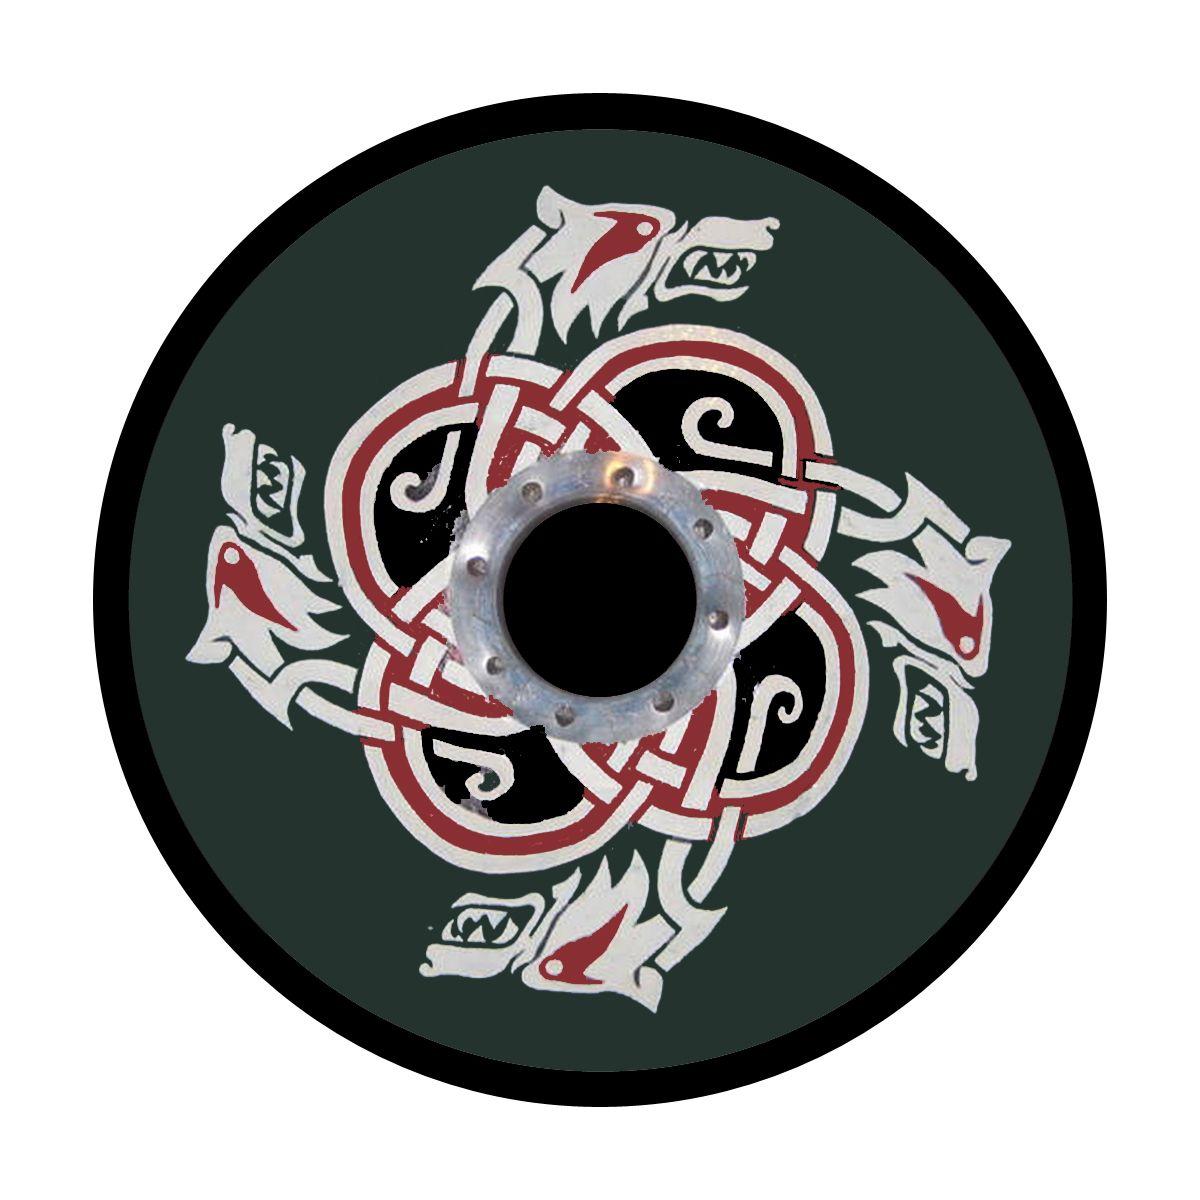 Viking Shield In 2018 Astrid Pinterest Viking Shield Vikings